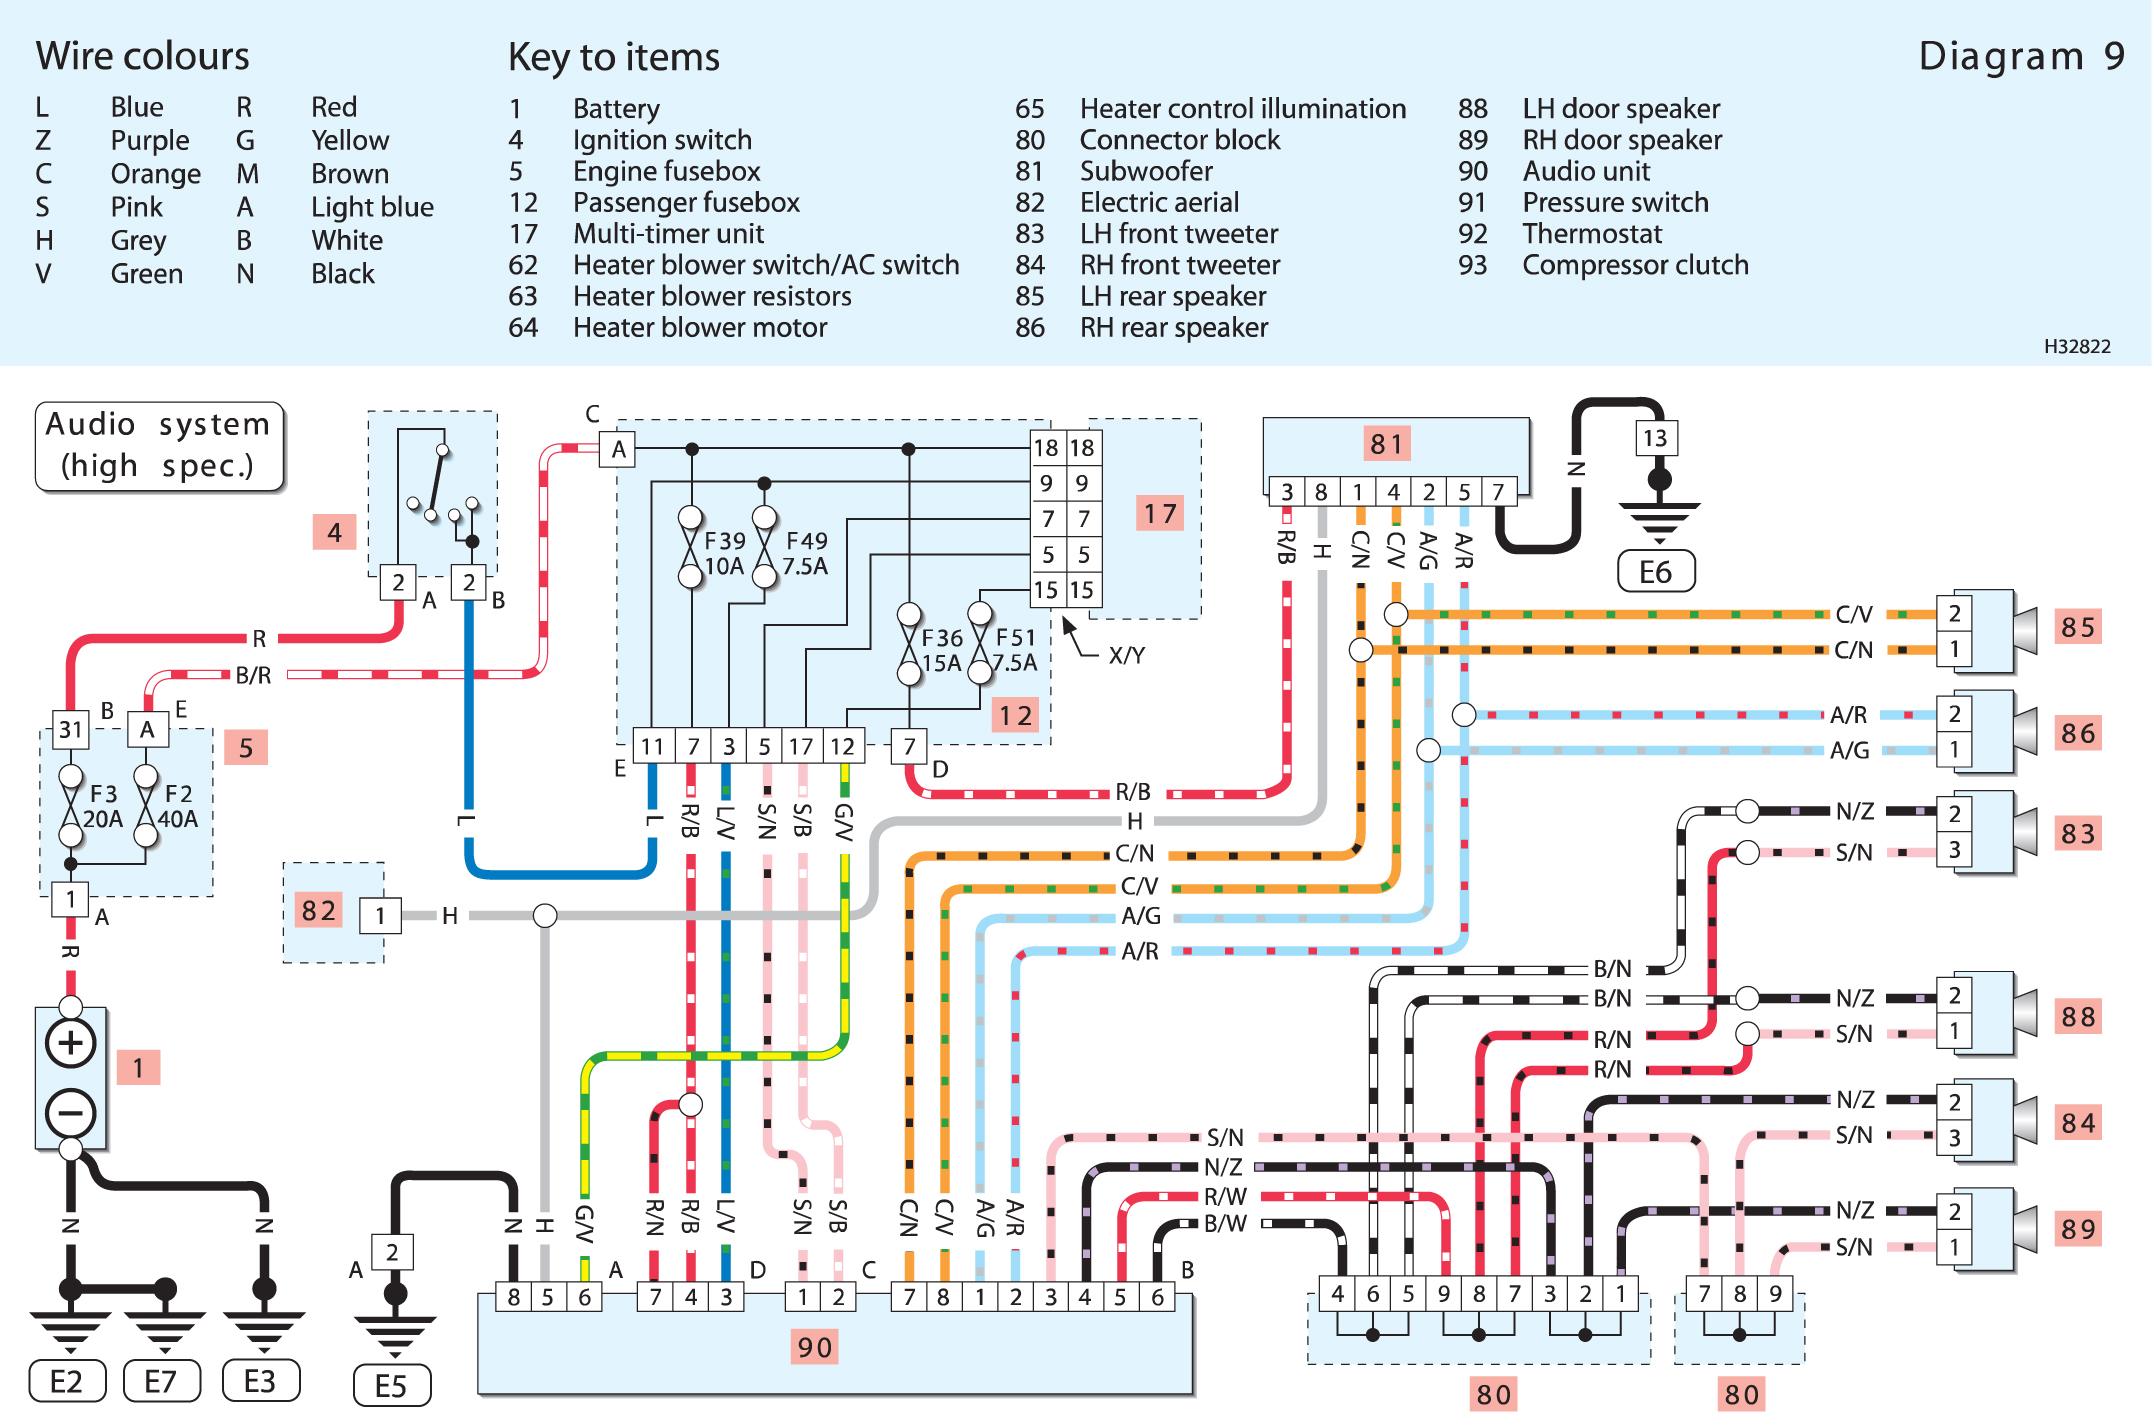 medium resolution of wiring diagram for fiat punto mk2 wiring diagram note fiat punto 2 wiring diagram fiat punto 2001 wiring diagram